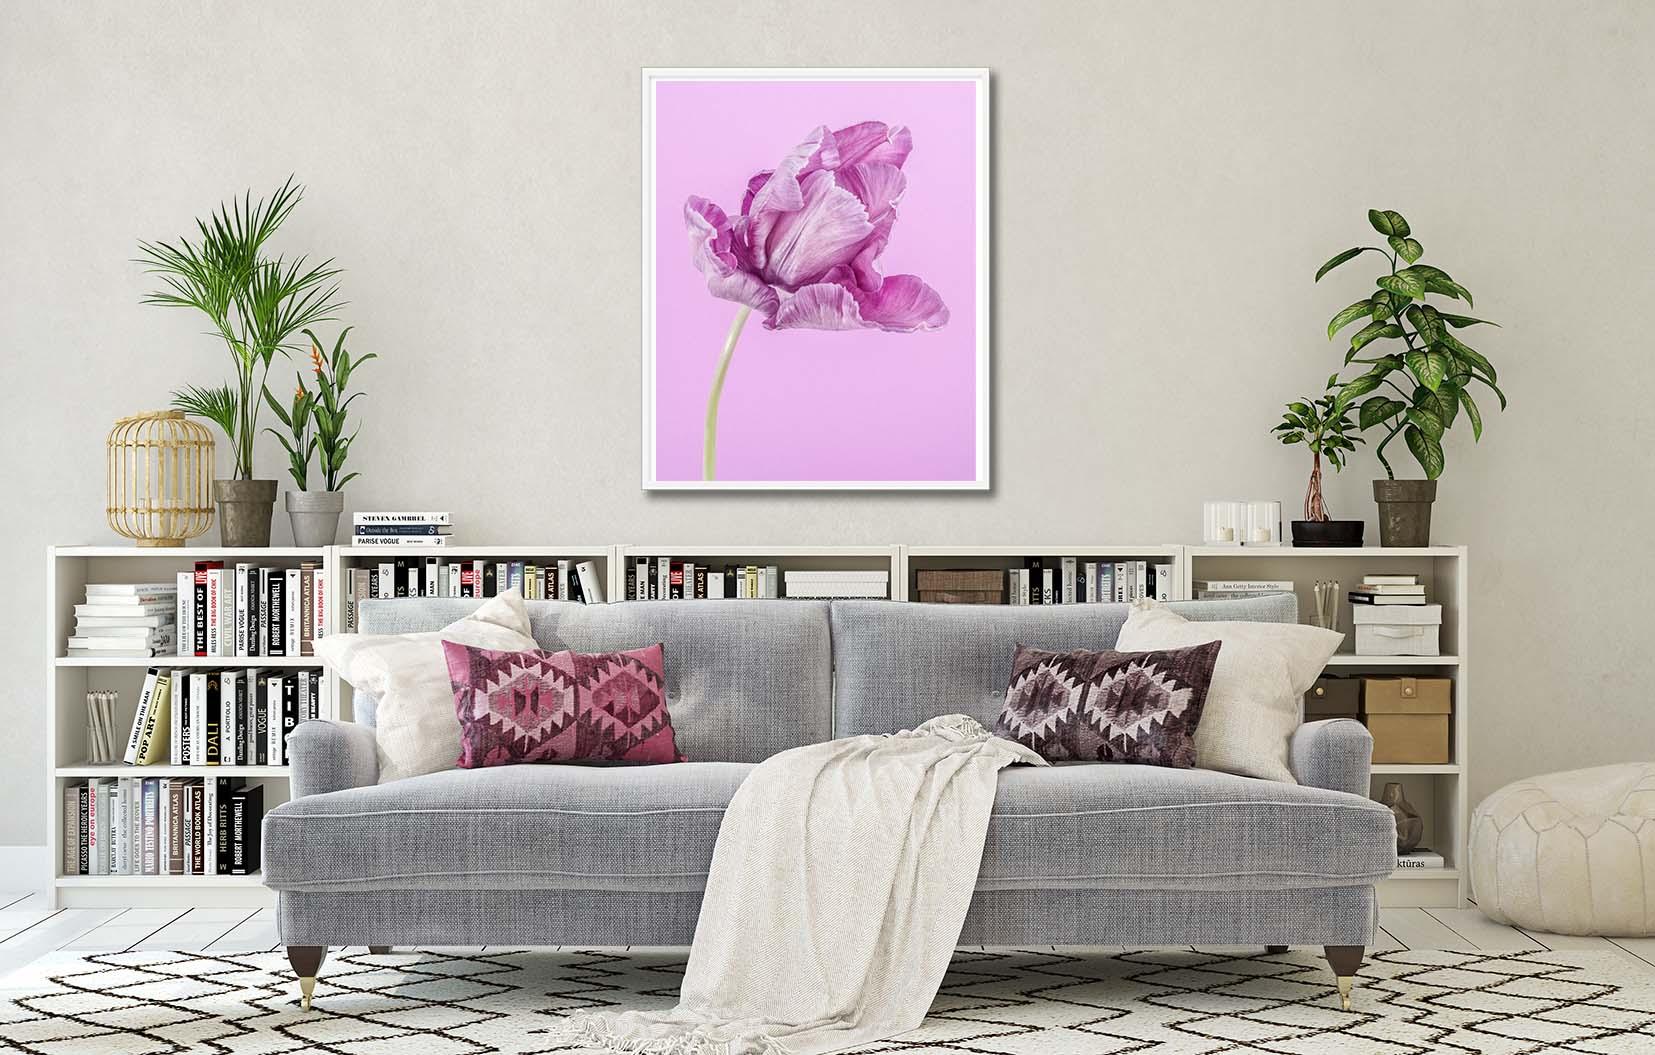 A fine art floral print of a purple tulip on a purple backgrounf. Limited edition prints by fine art photographer Paul Coghlin FBIPP.